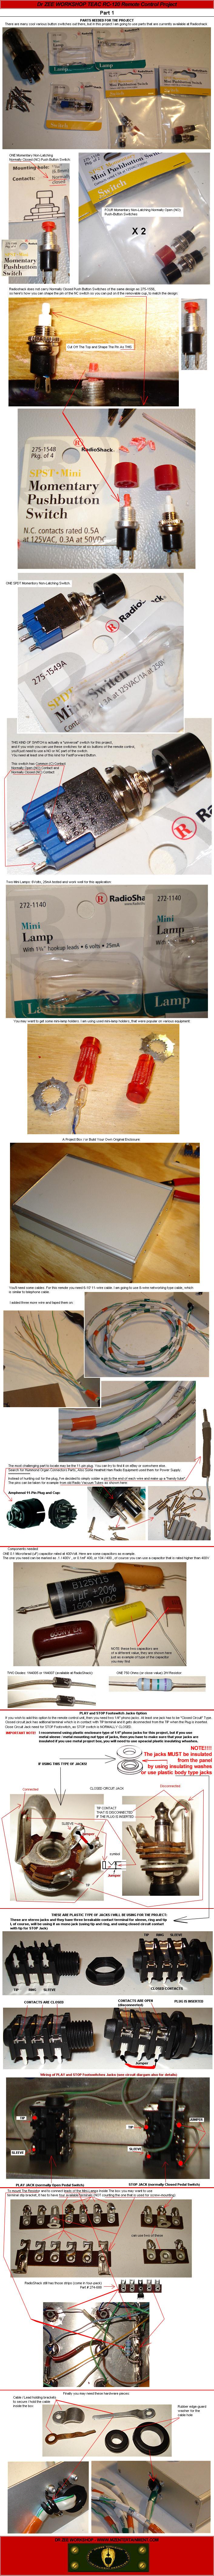 medium resolution of teac rc 120 remote control diy project part 1 components